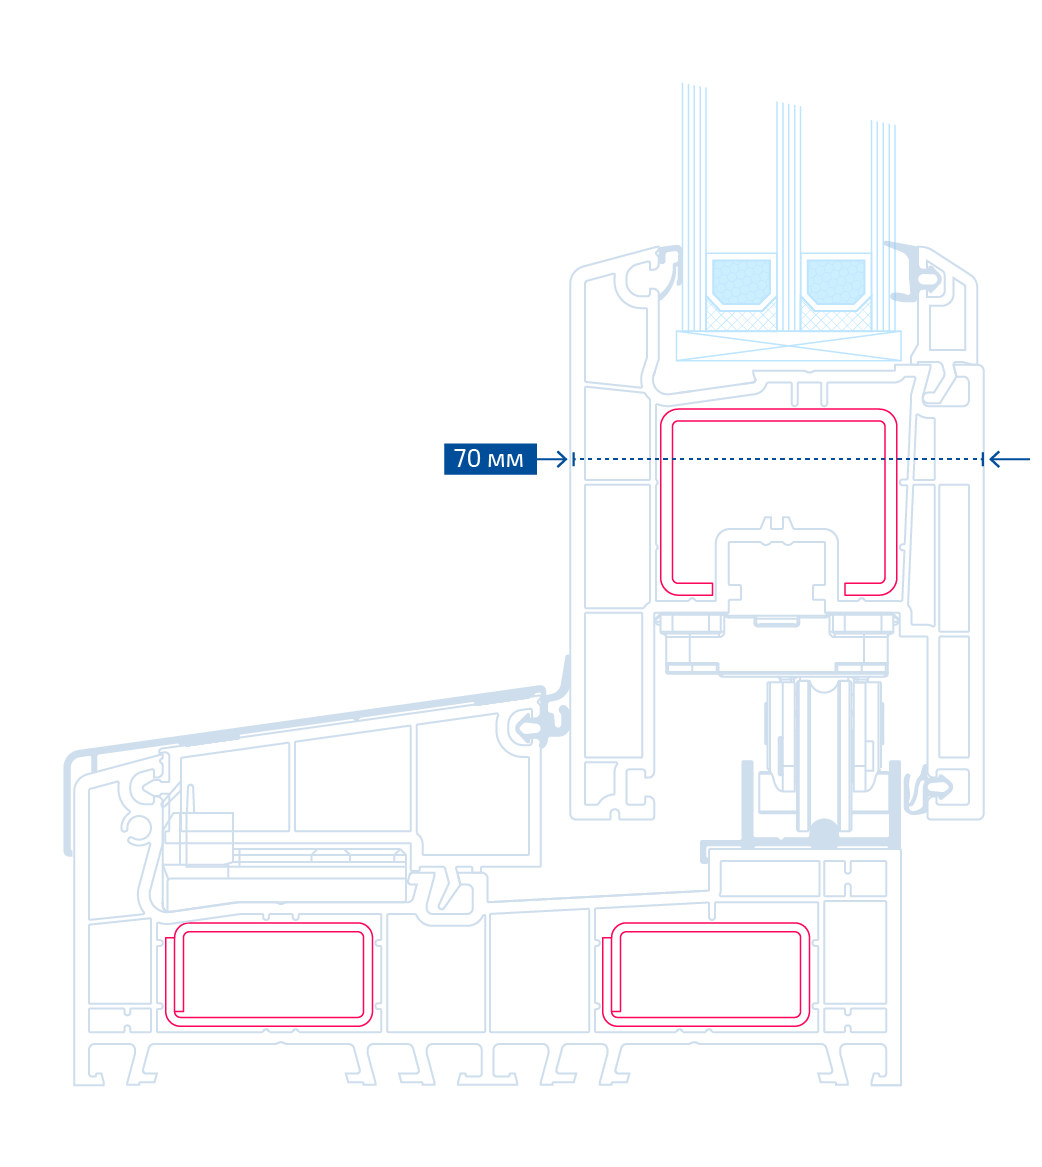 схема розсувної системи Smart Slide